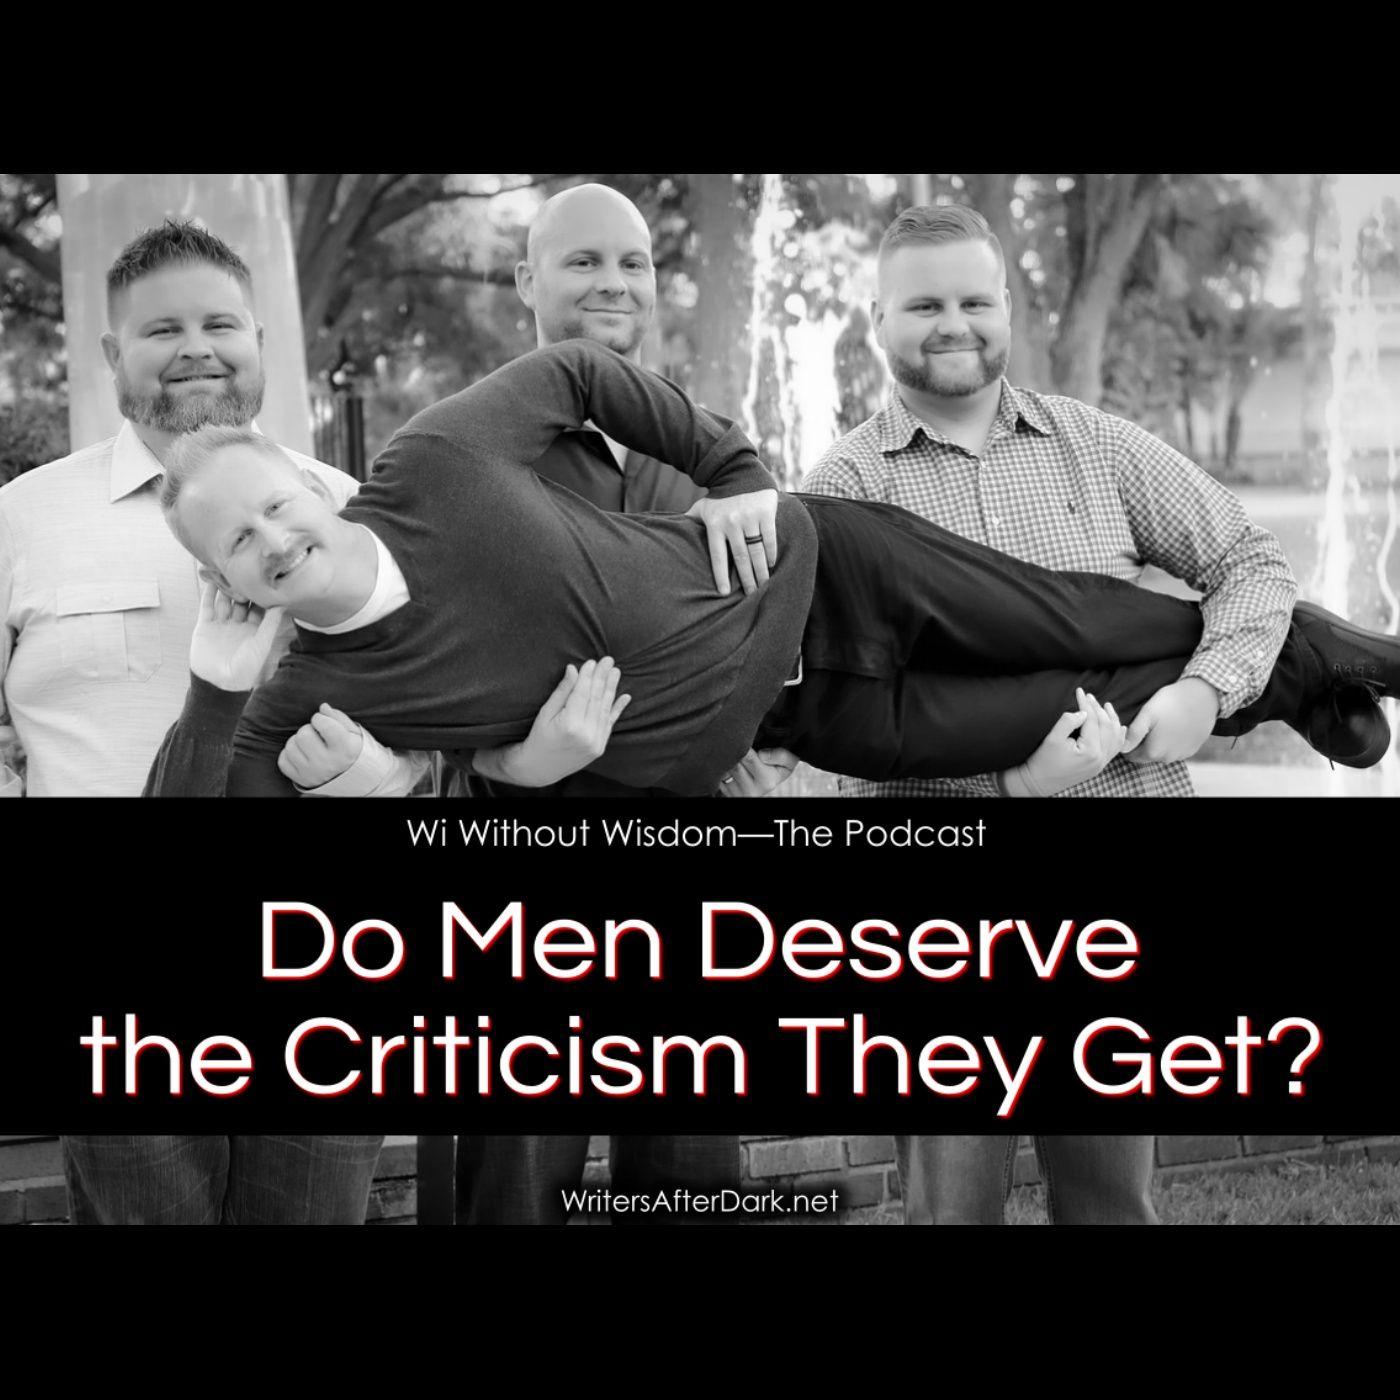 Do Men Deserve the Criticism They Get?